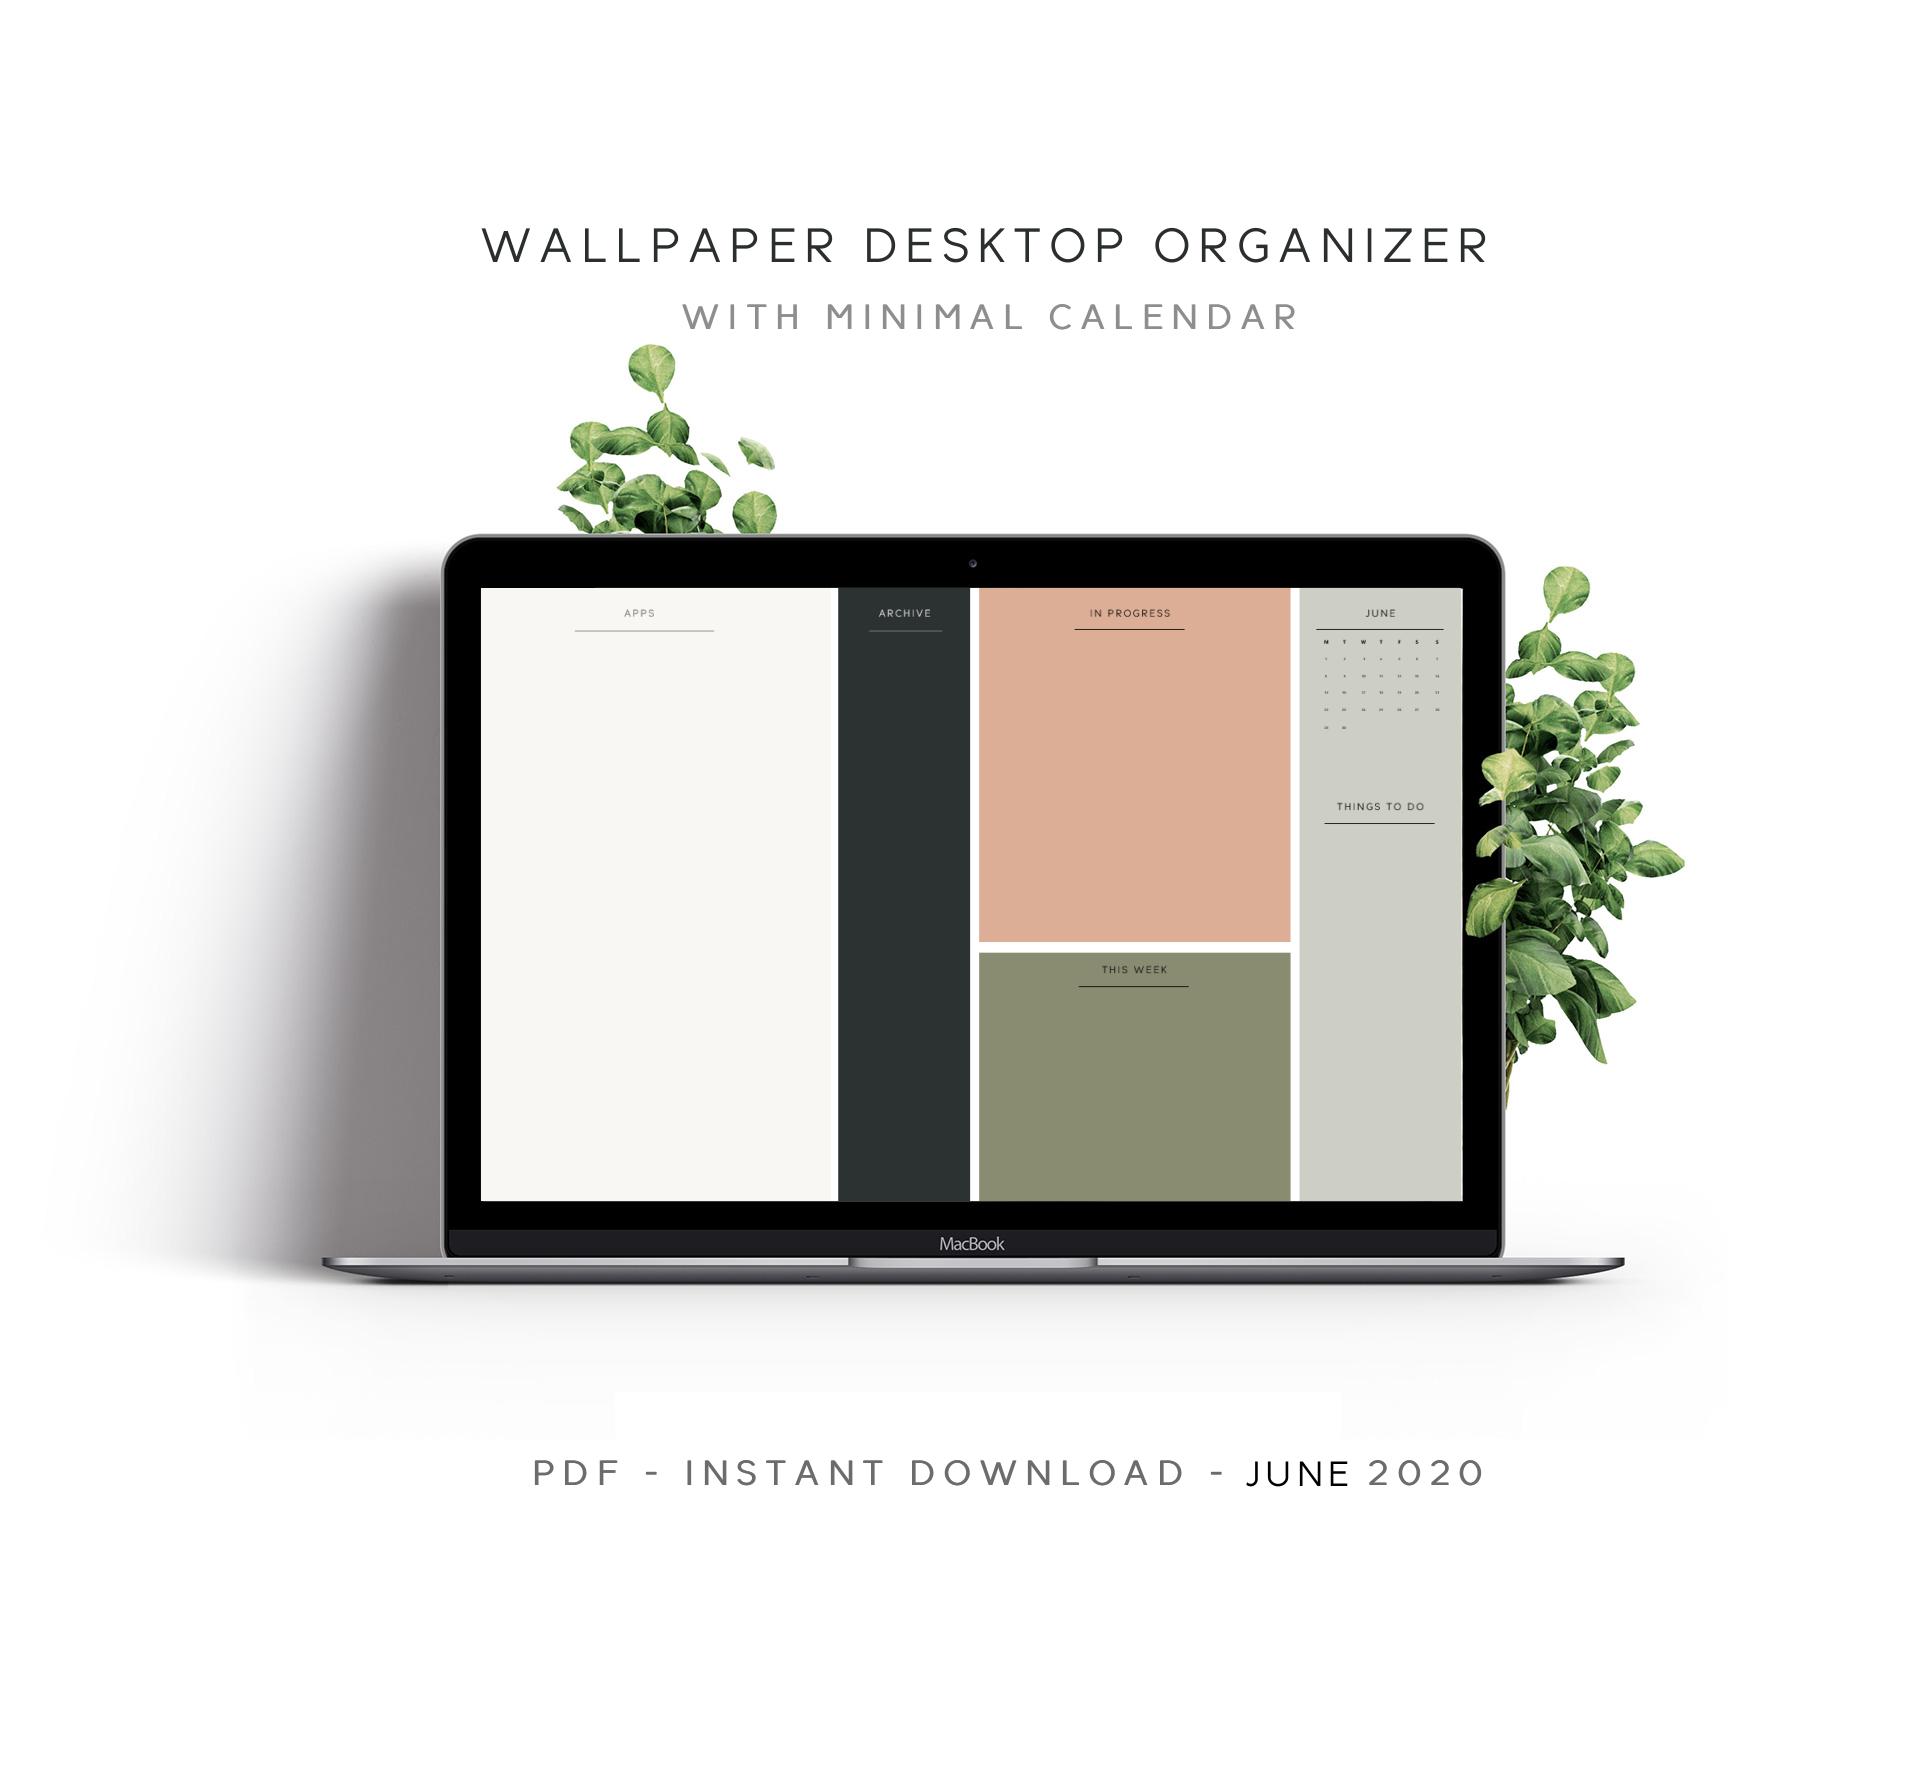 June 2020 Desktop Wallpaper Organizer With Minimalist Calendar Minimalist Desktop Wallpaper Desktop Wallpaper Organizer Iphone Minimalist Wallpaper